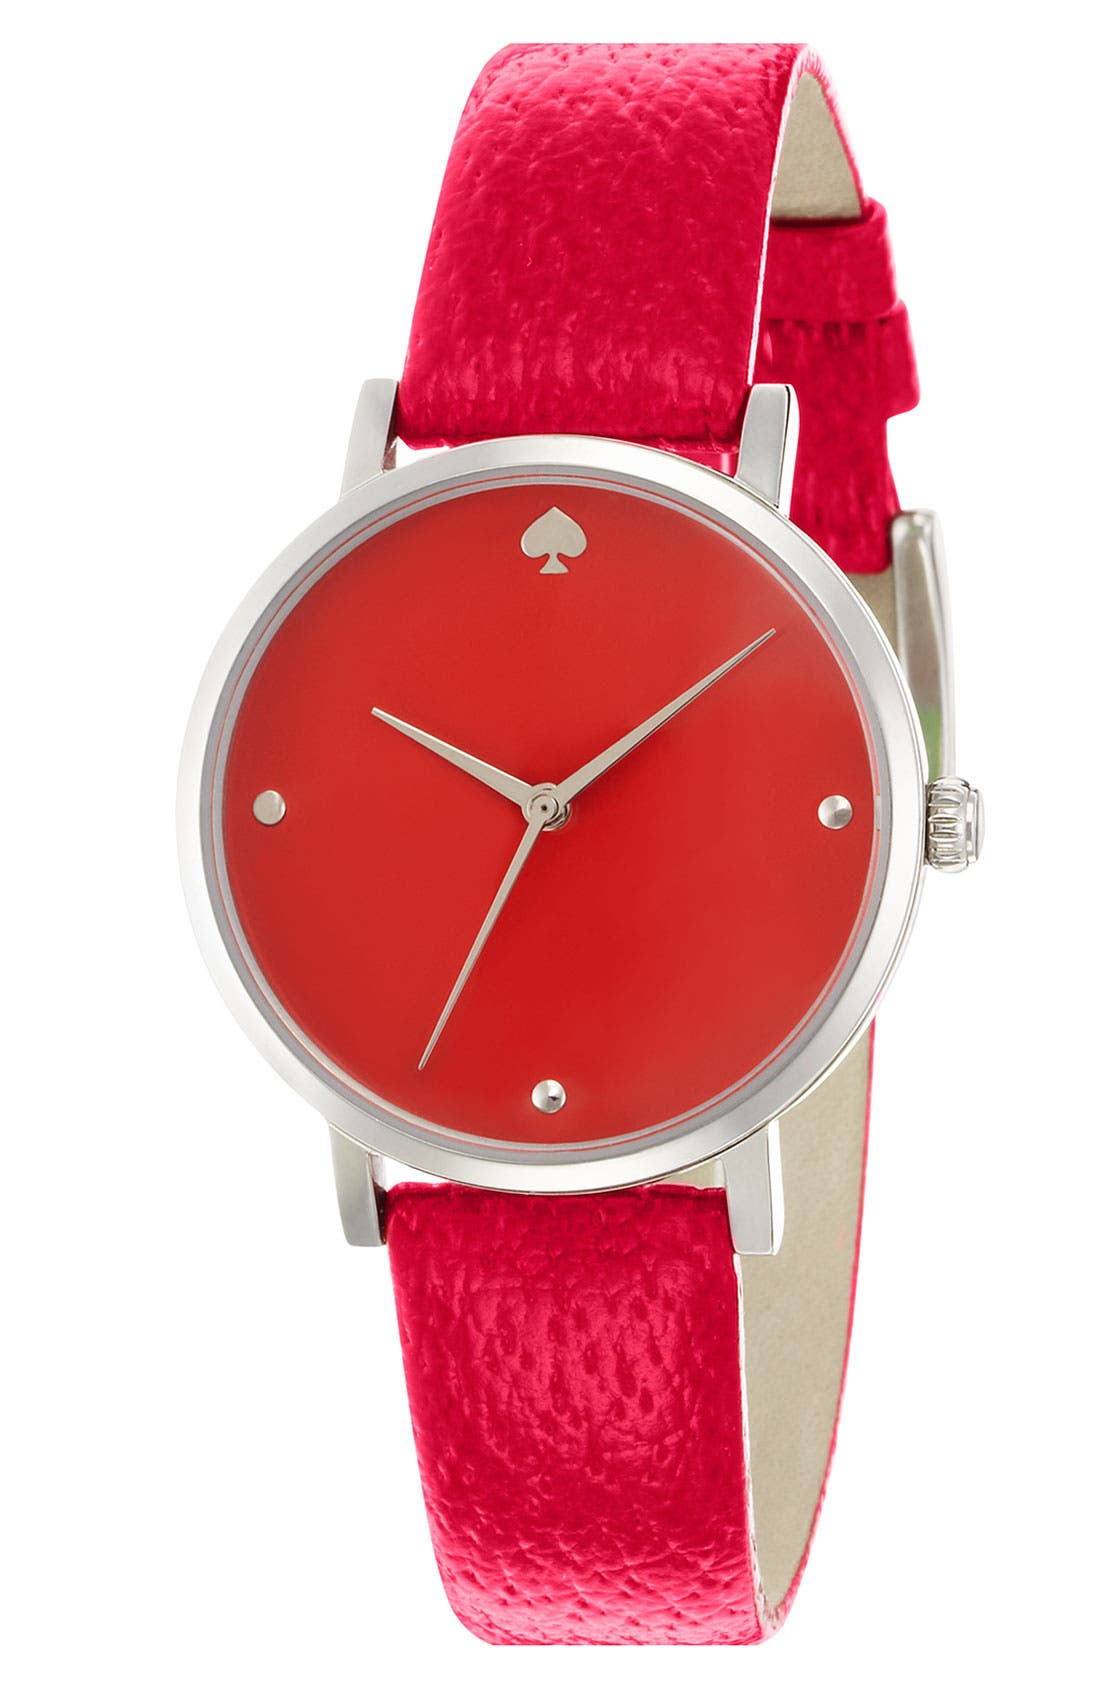 Main Image - kate spade new york 'metro' leather strap watch